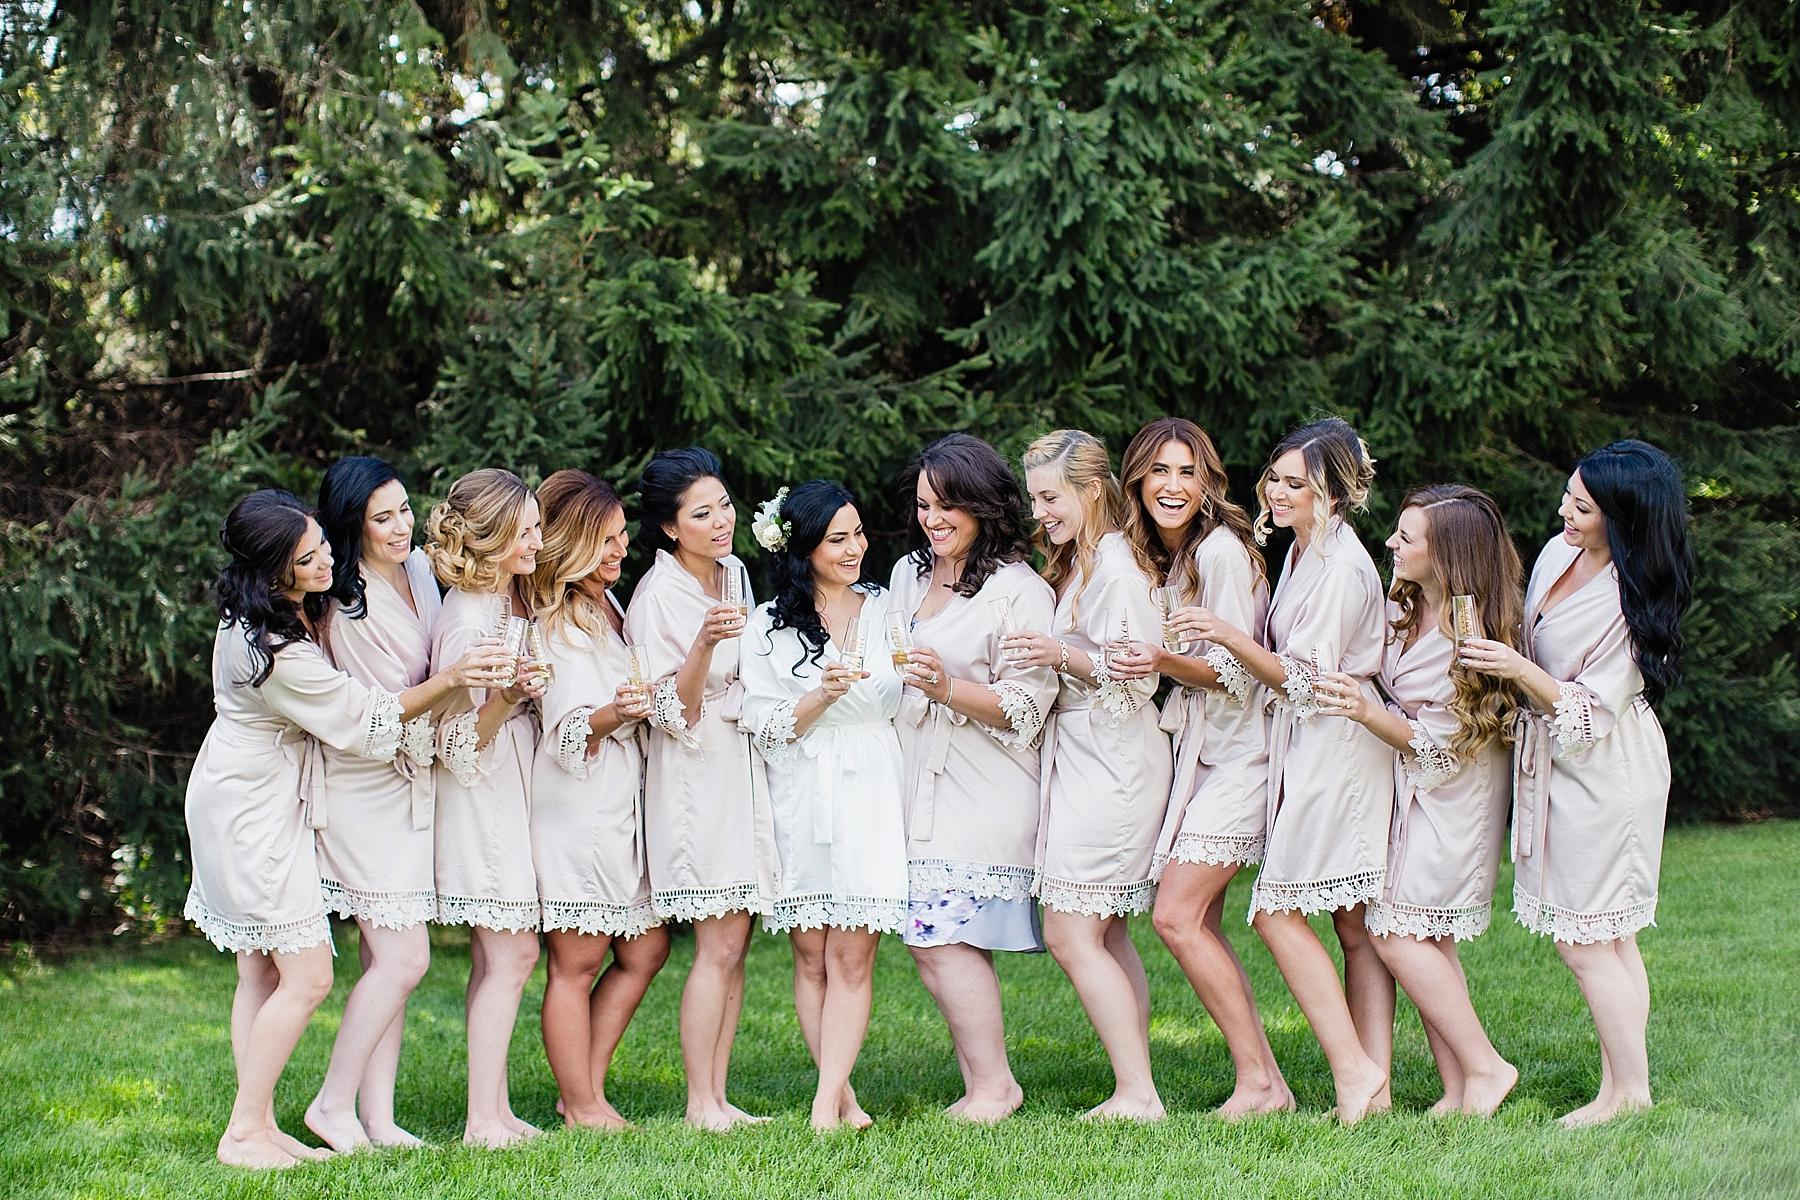 windsor-wedding-photographer-sprucewood-shores-winery-wedding-niagara-on-the-lake-wedding-photographer-eryn-shea-photography_0008.jpg